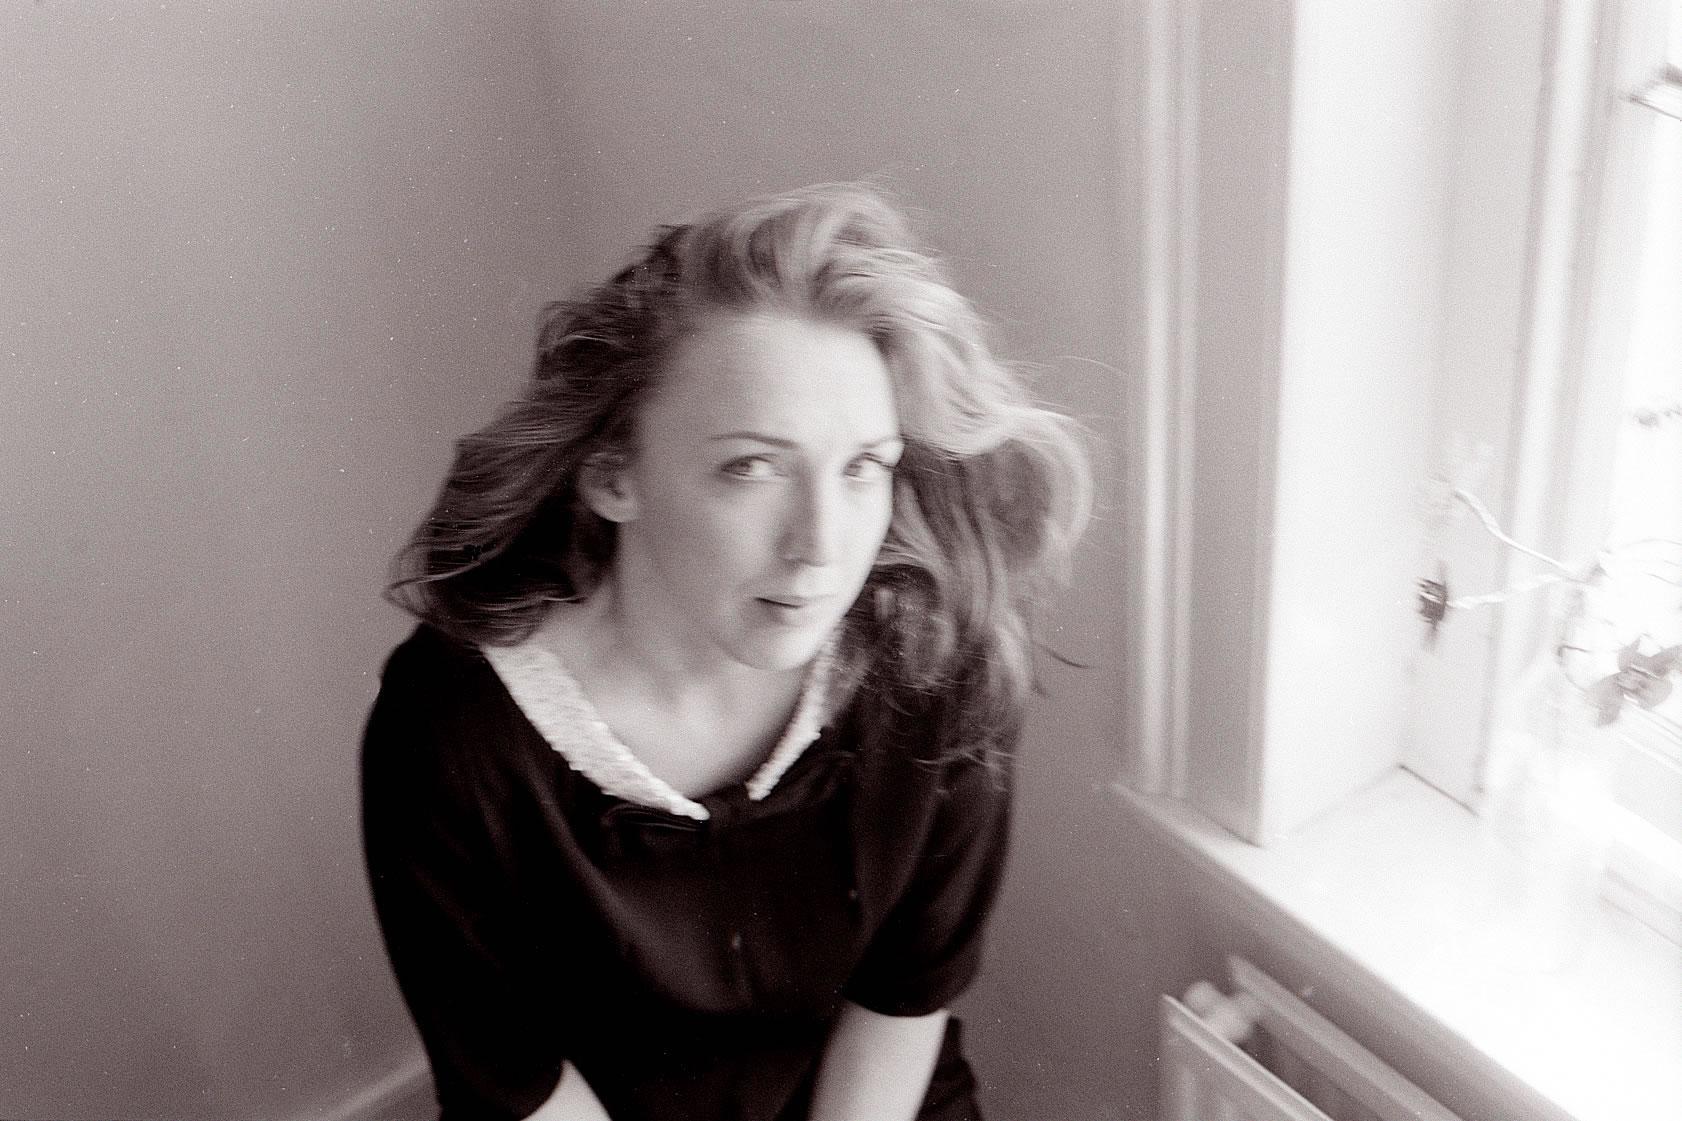 GIRL AT WINDOW IN BLACK DRESS